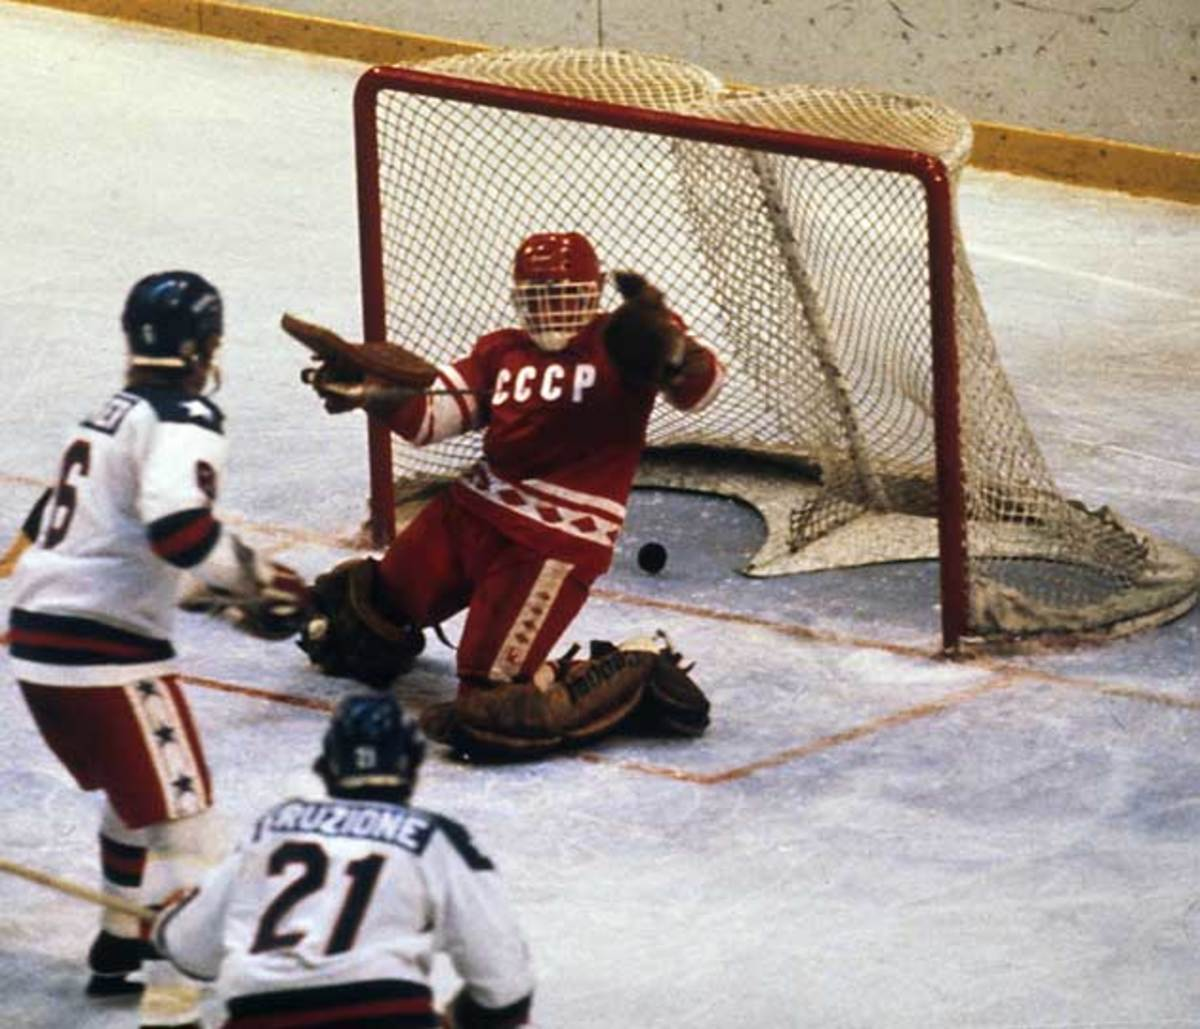 Mike Eruzione (21) of the U.S. wristed the winning goal past Vladimir Myshkin at Lake Placid in 1980.